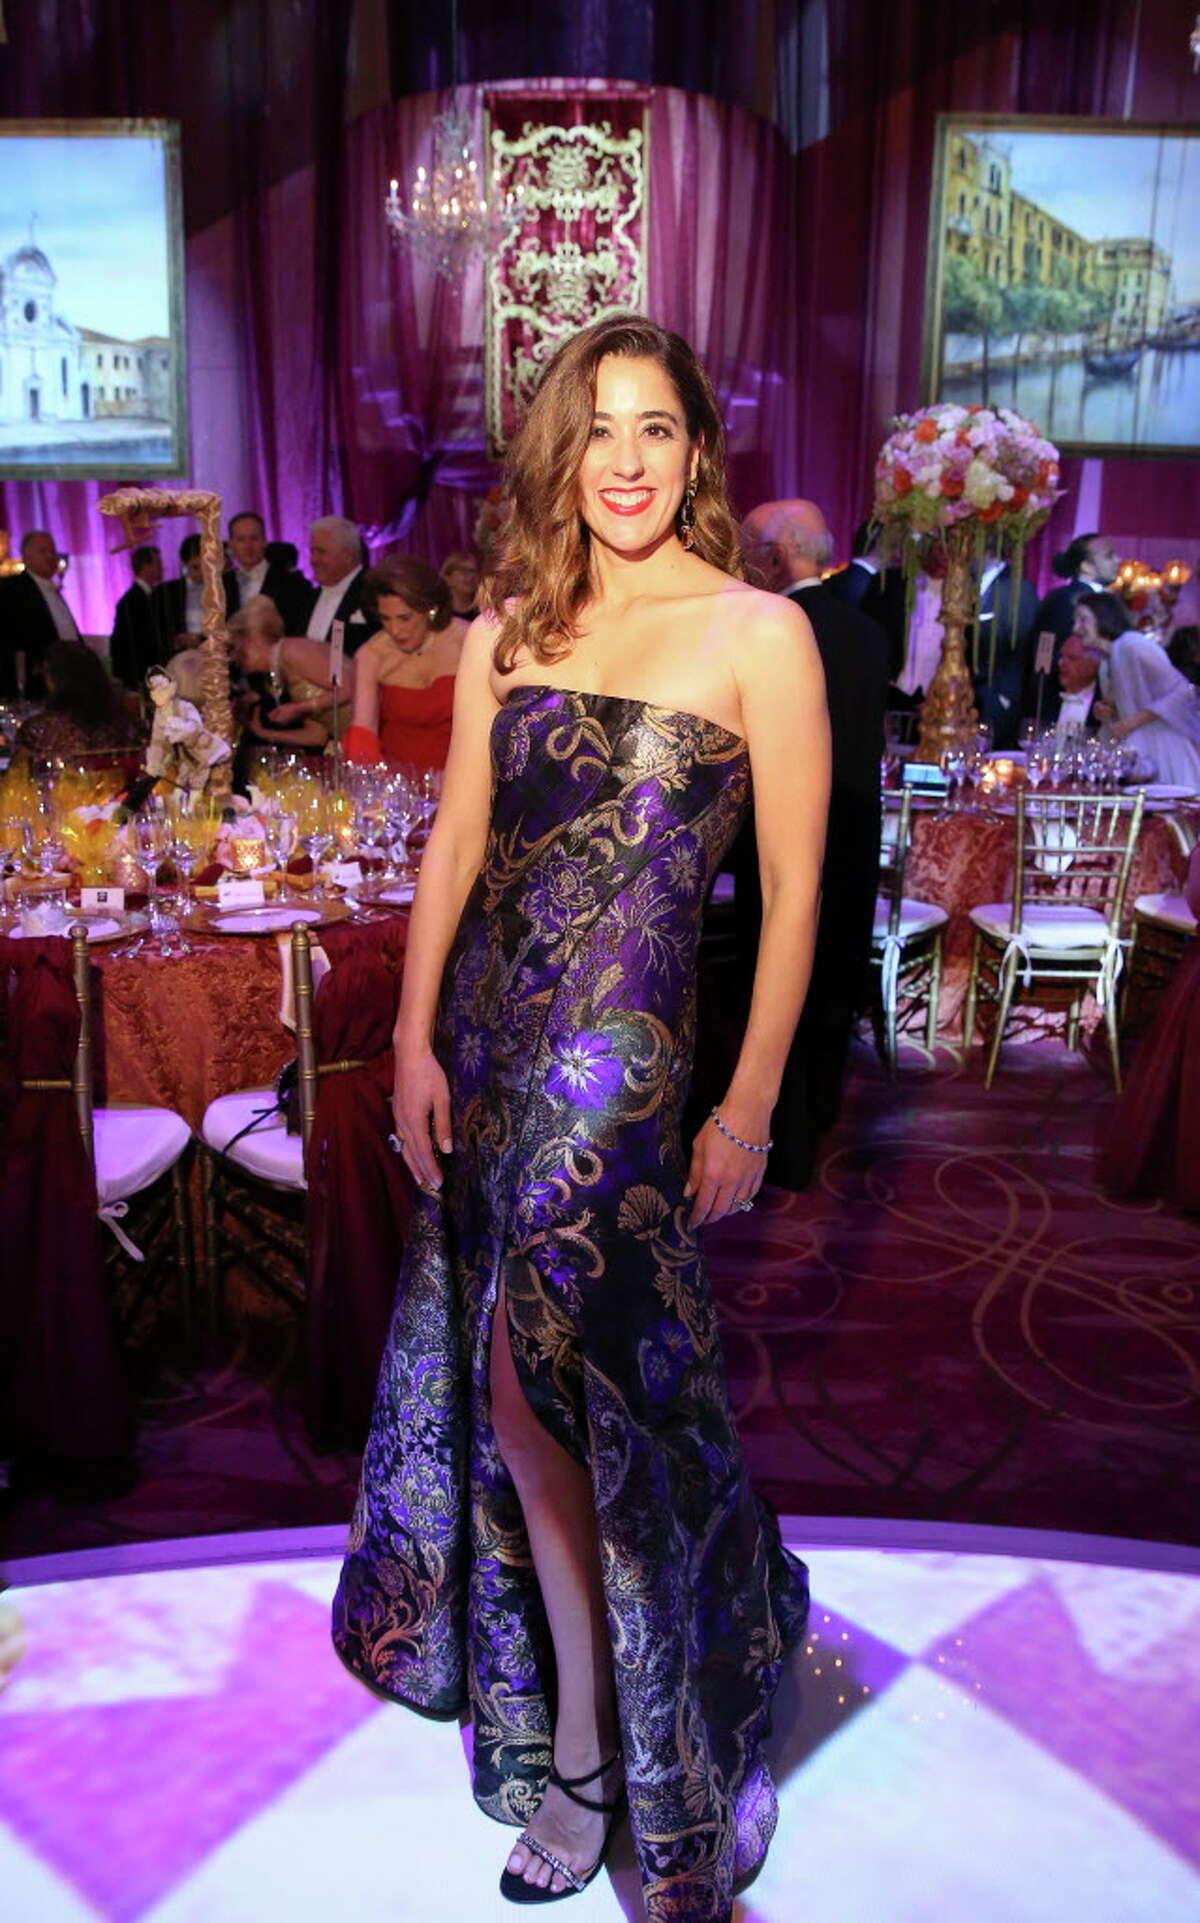 Kristina Somerville, philanthropist